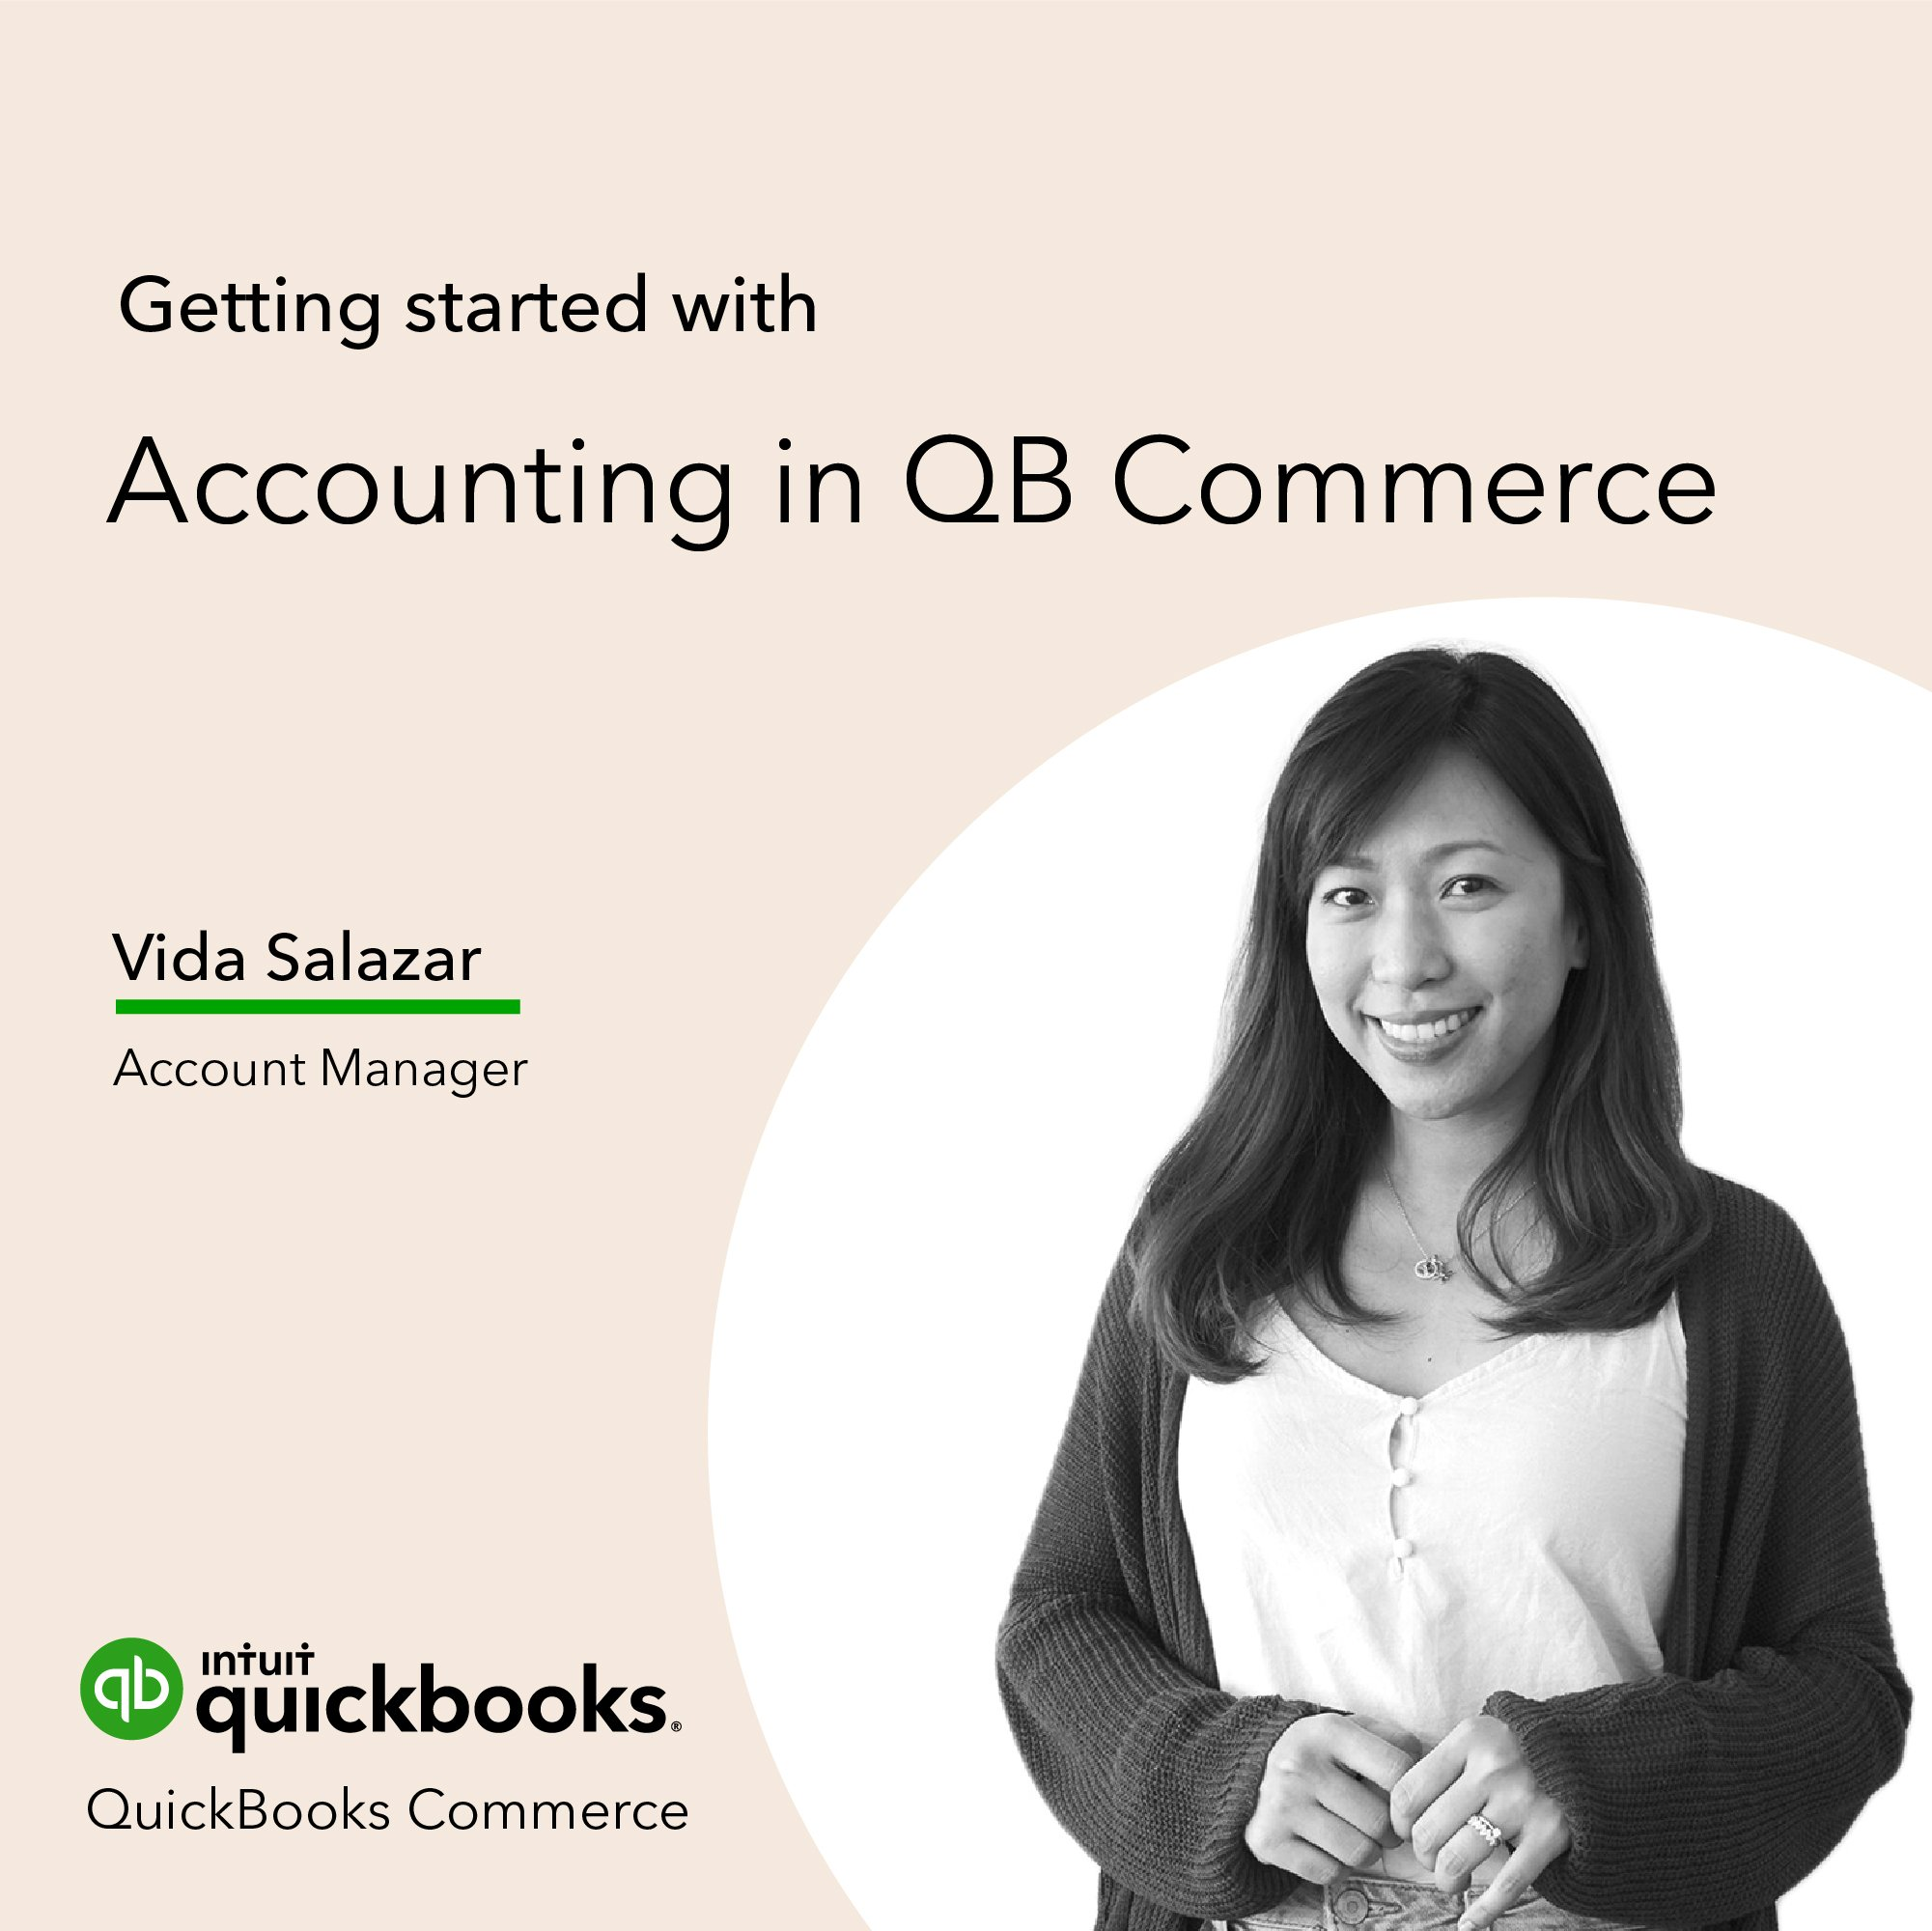 IG-accounting